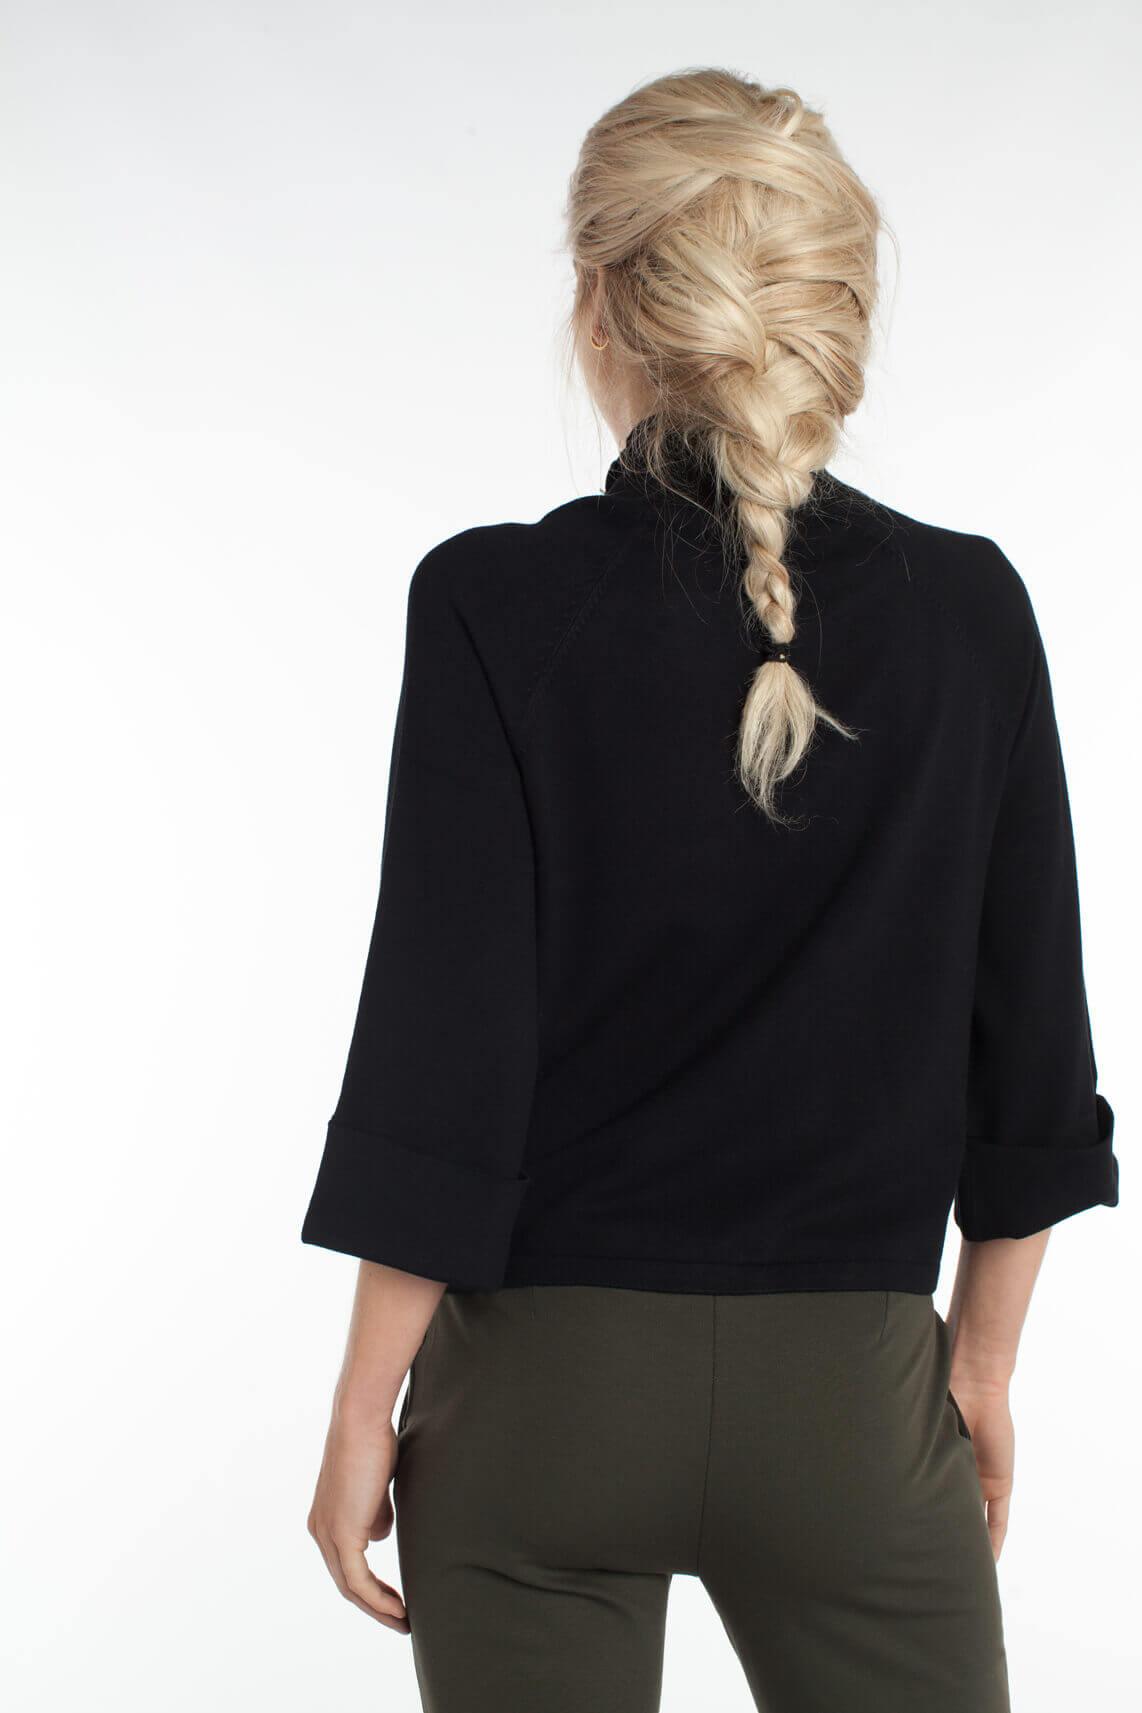 Anna Dames Pullover met sierknoopjes zwart